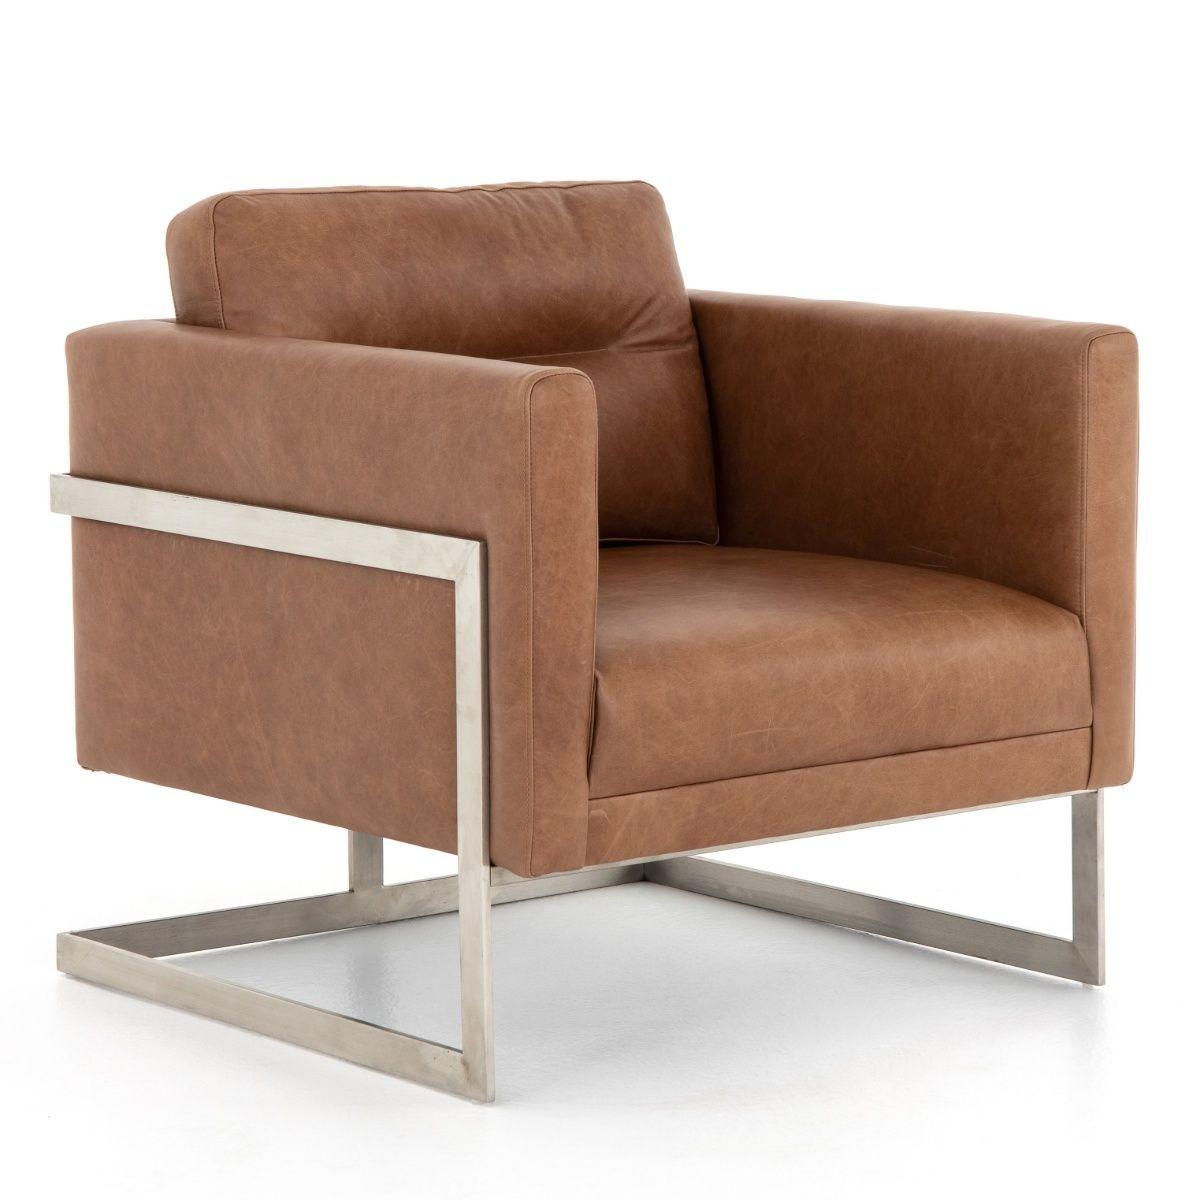 Fiona Modern Tan Leather Club Chair Leather Club Chairs Club